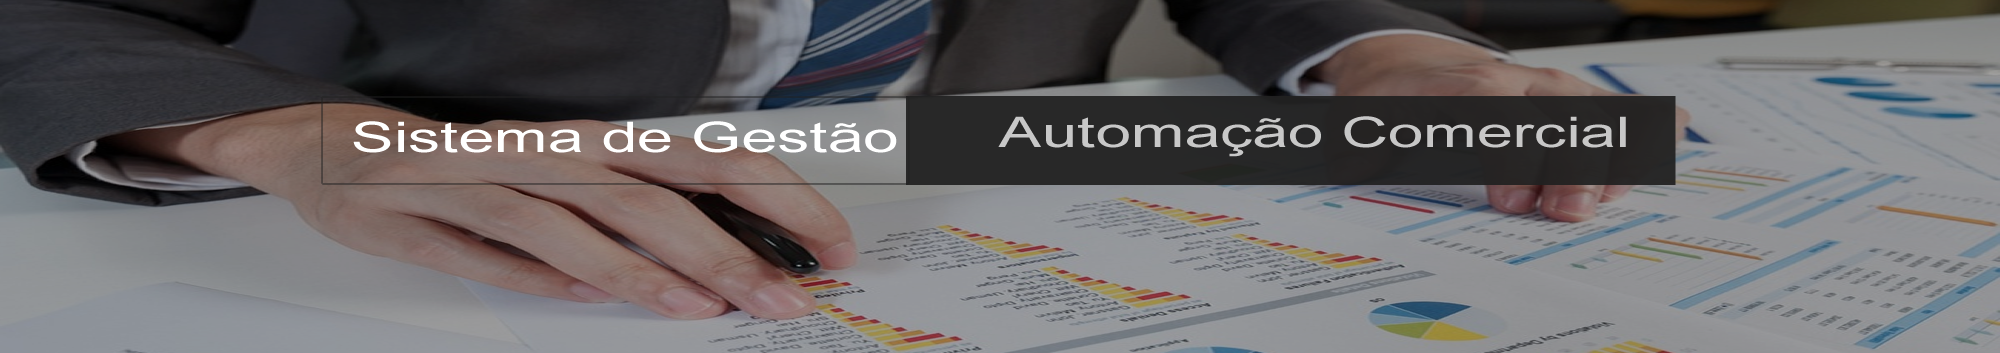 sistema-automacao-comercal-gestao-2